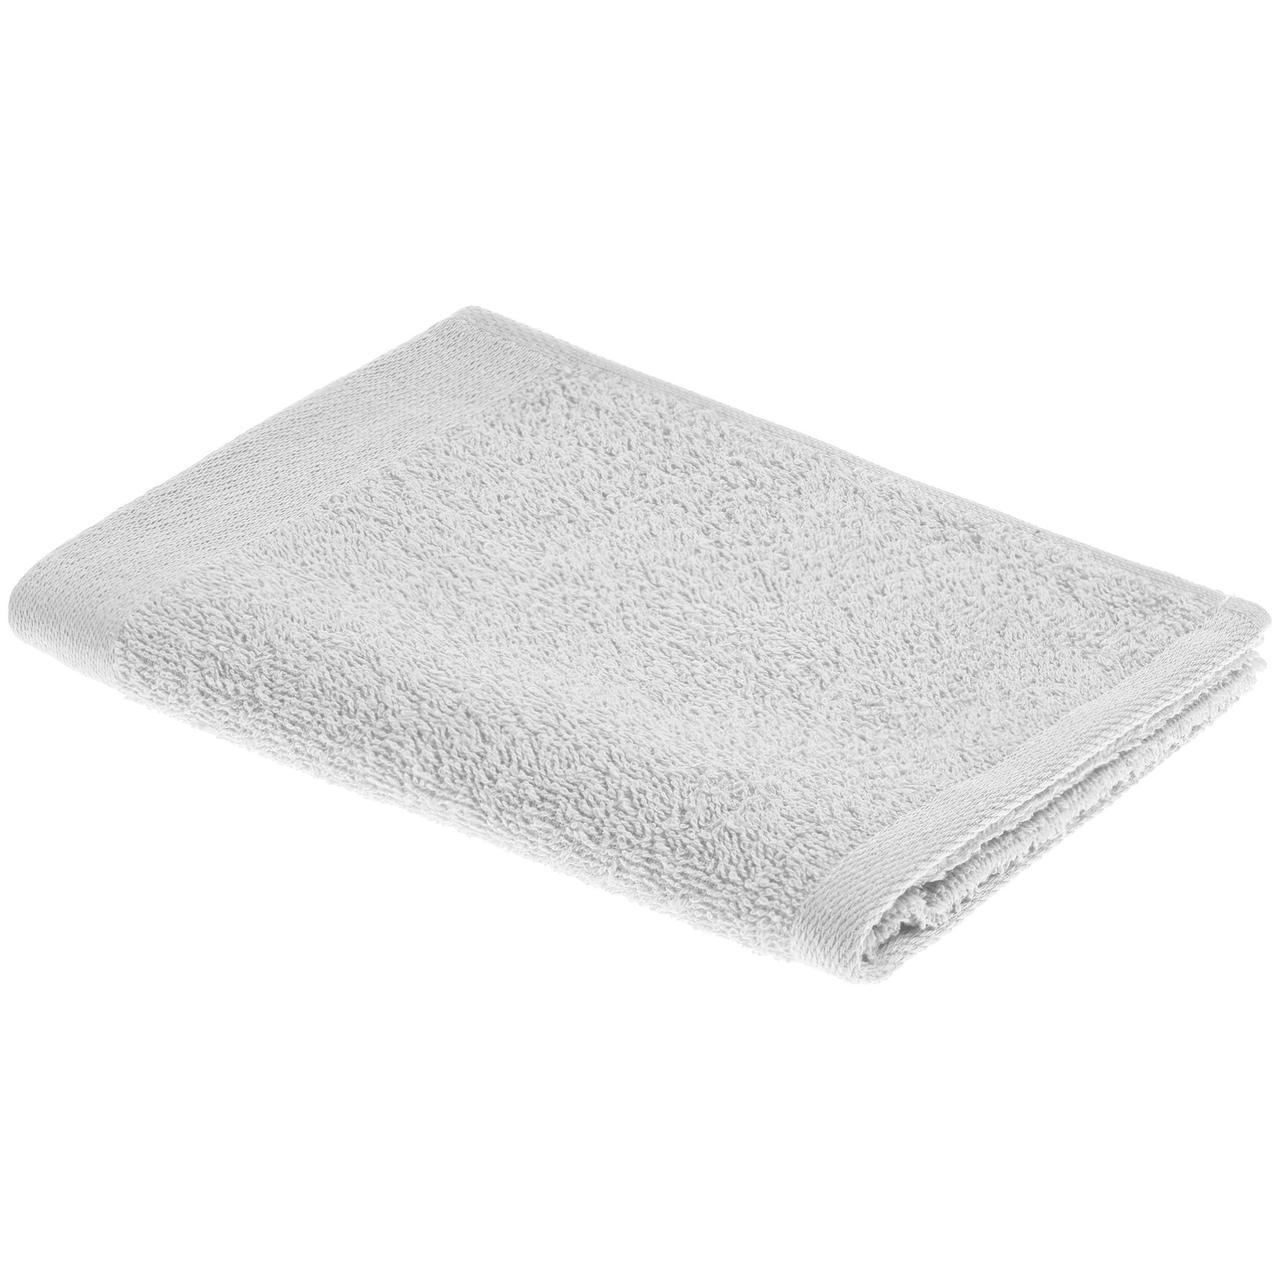 Полотенце Soft Me Light, малое, белое (артикул 15116.60)